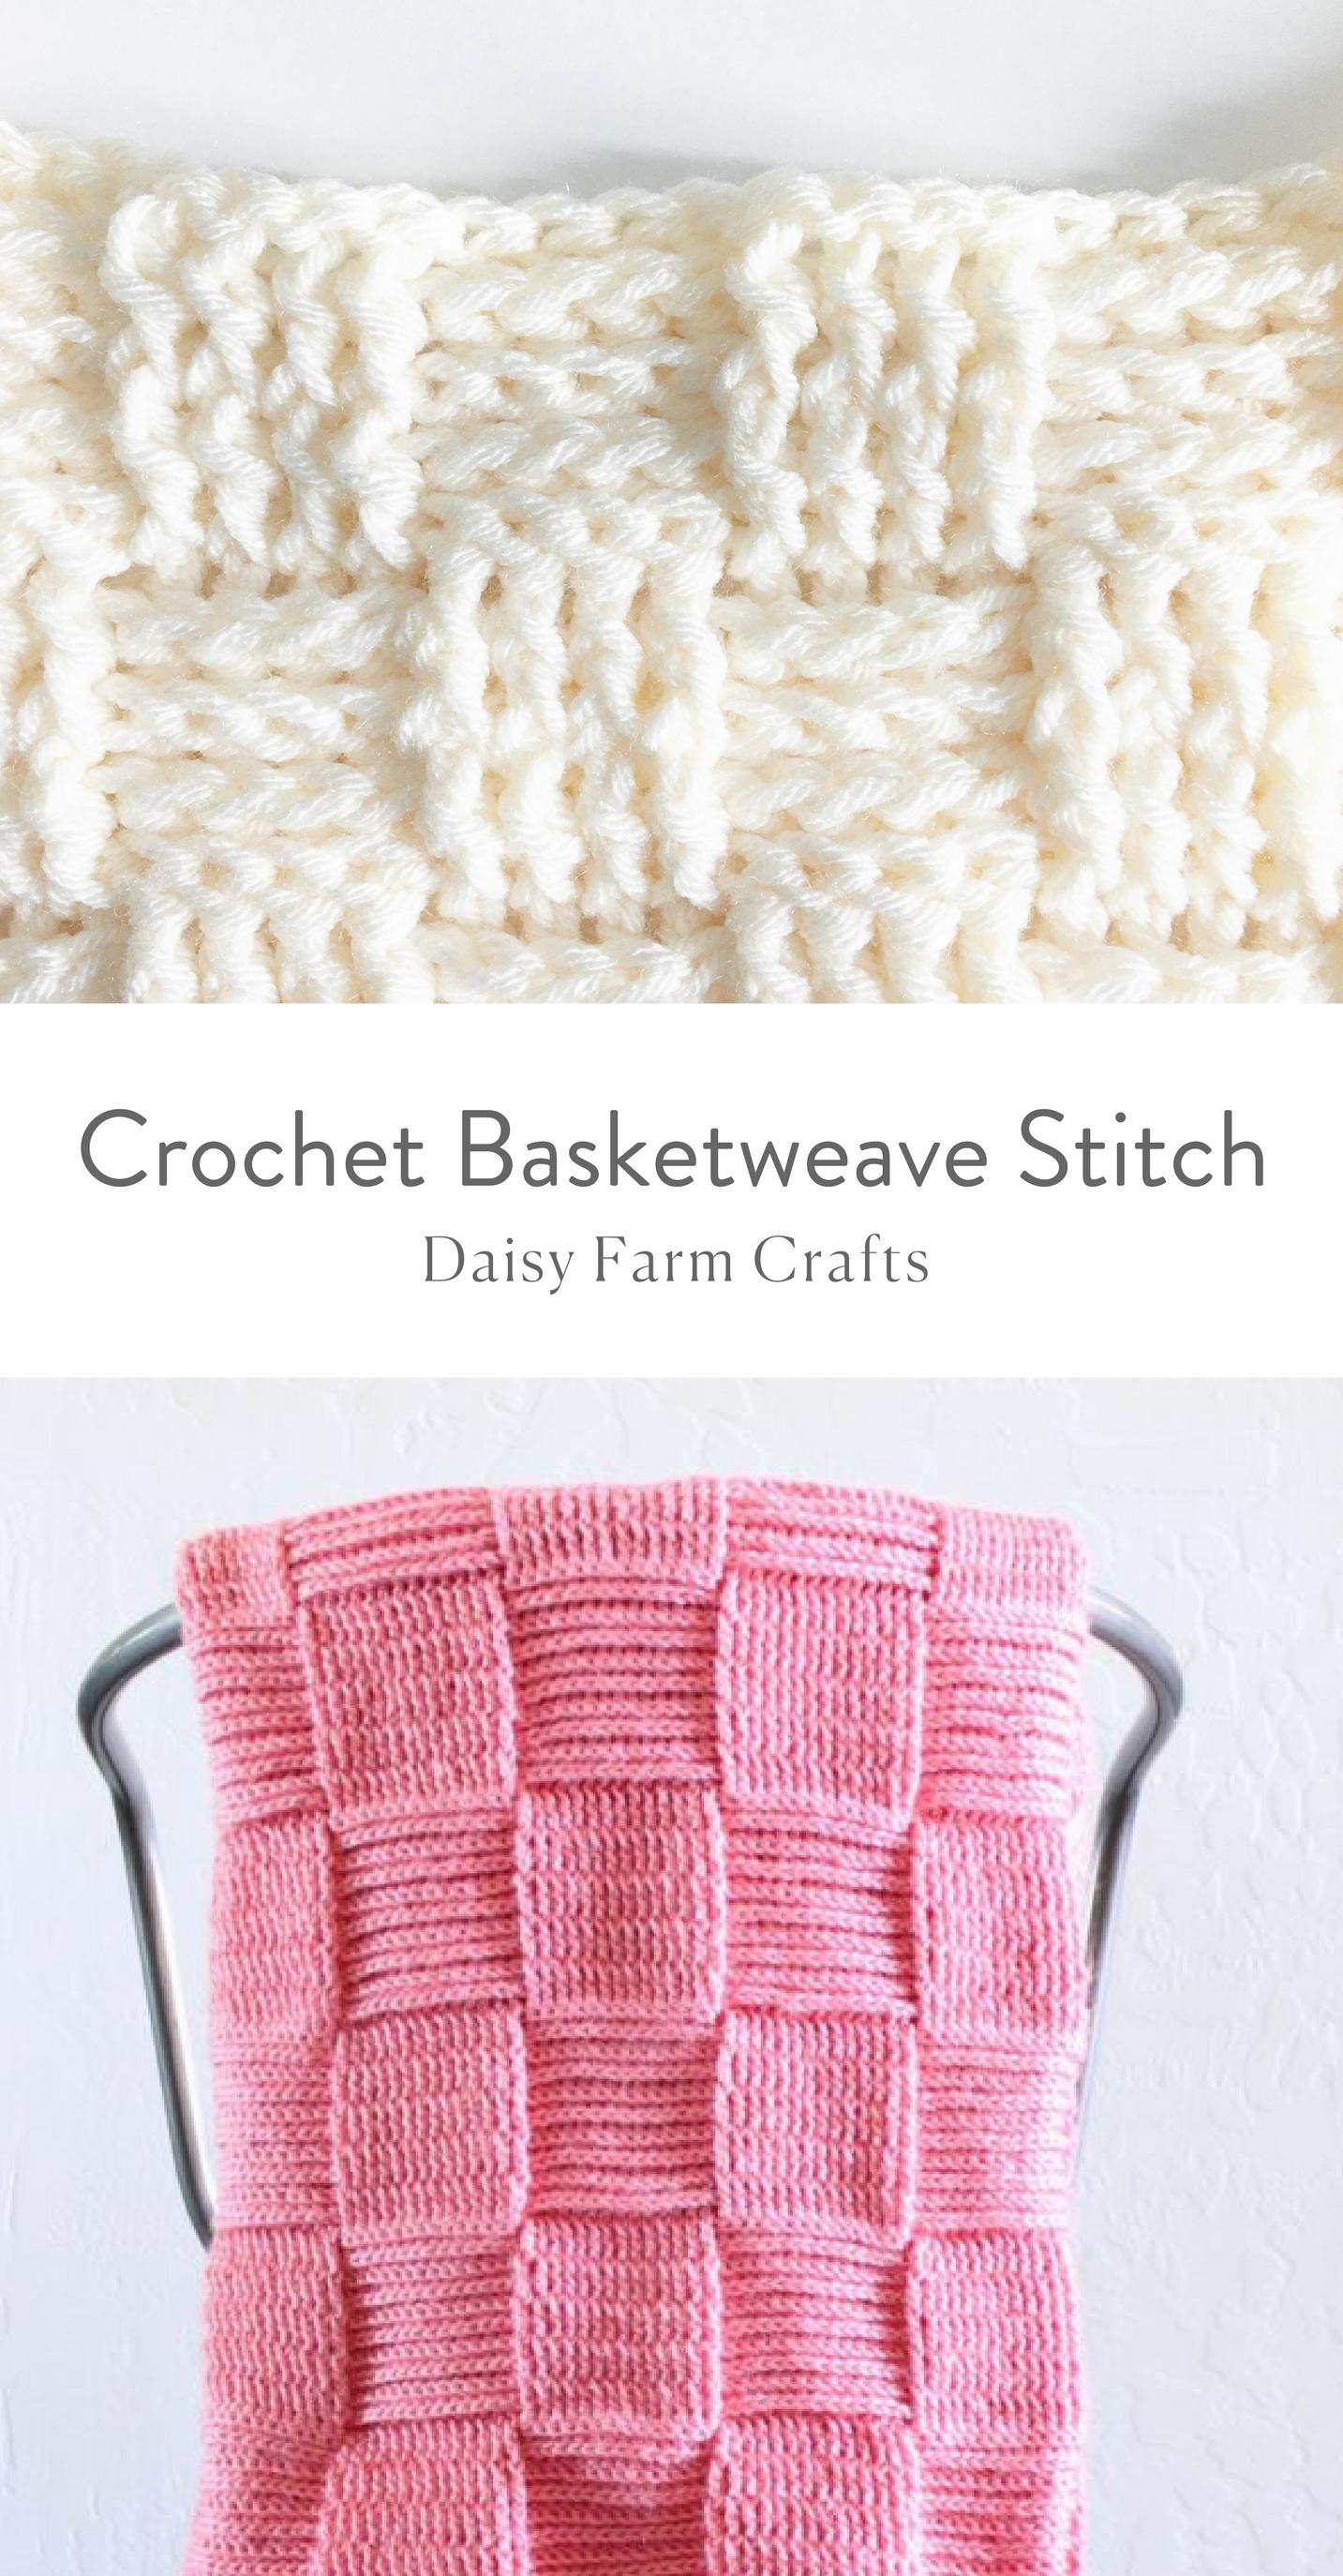 How to Crochet the Basketweave Stitch | CROCHET | Pinterest ...